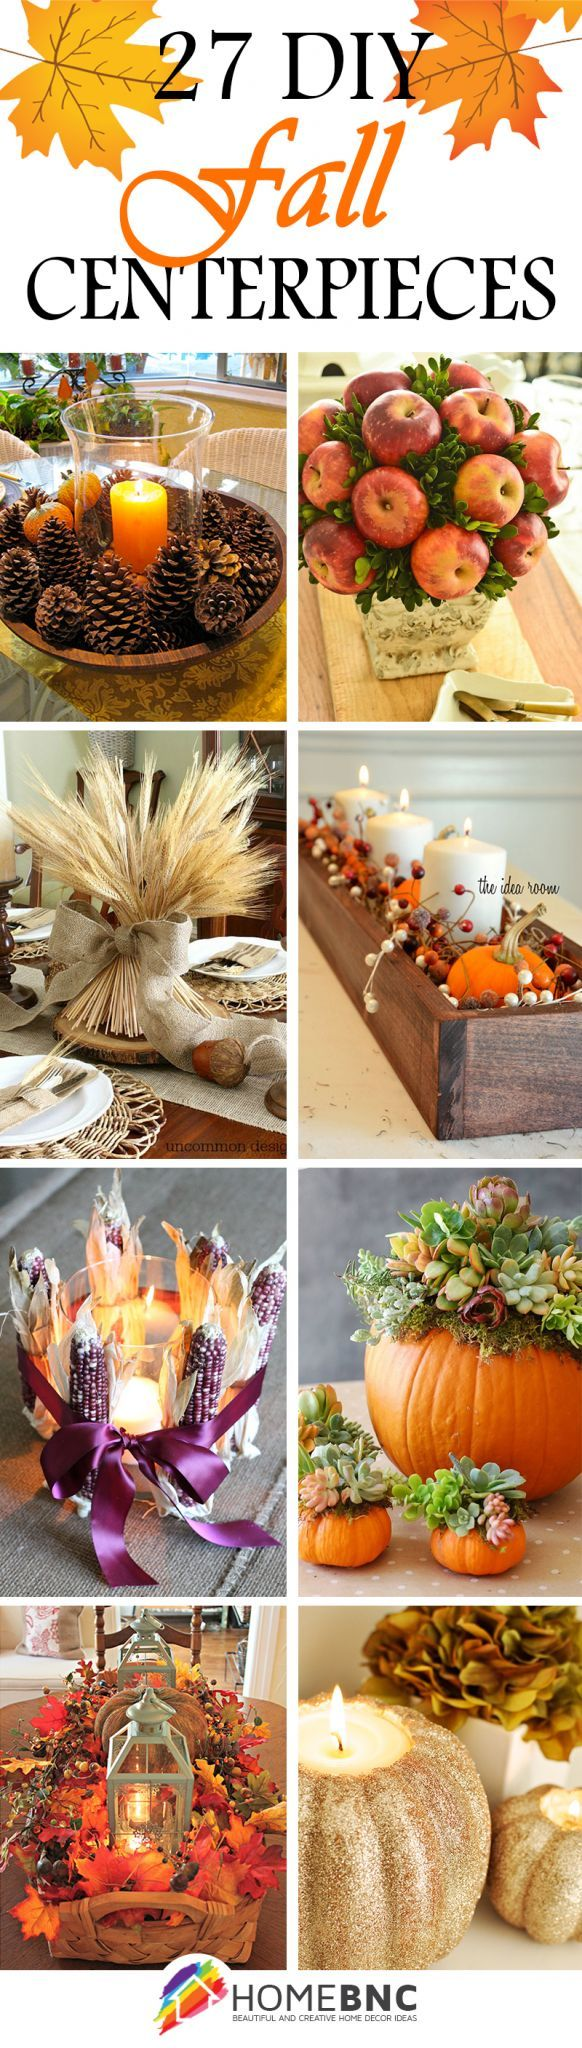 DIY Fall Centerpiece Decorations   Herbst dekor diy, Herbst ...